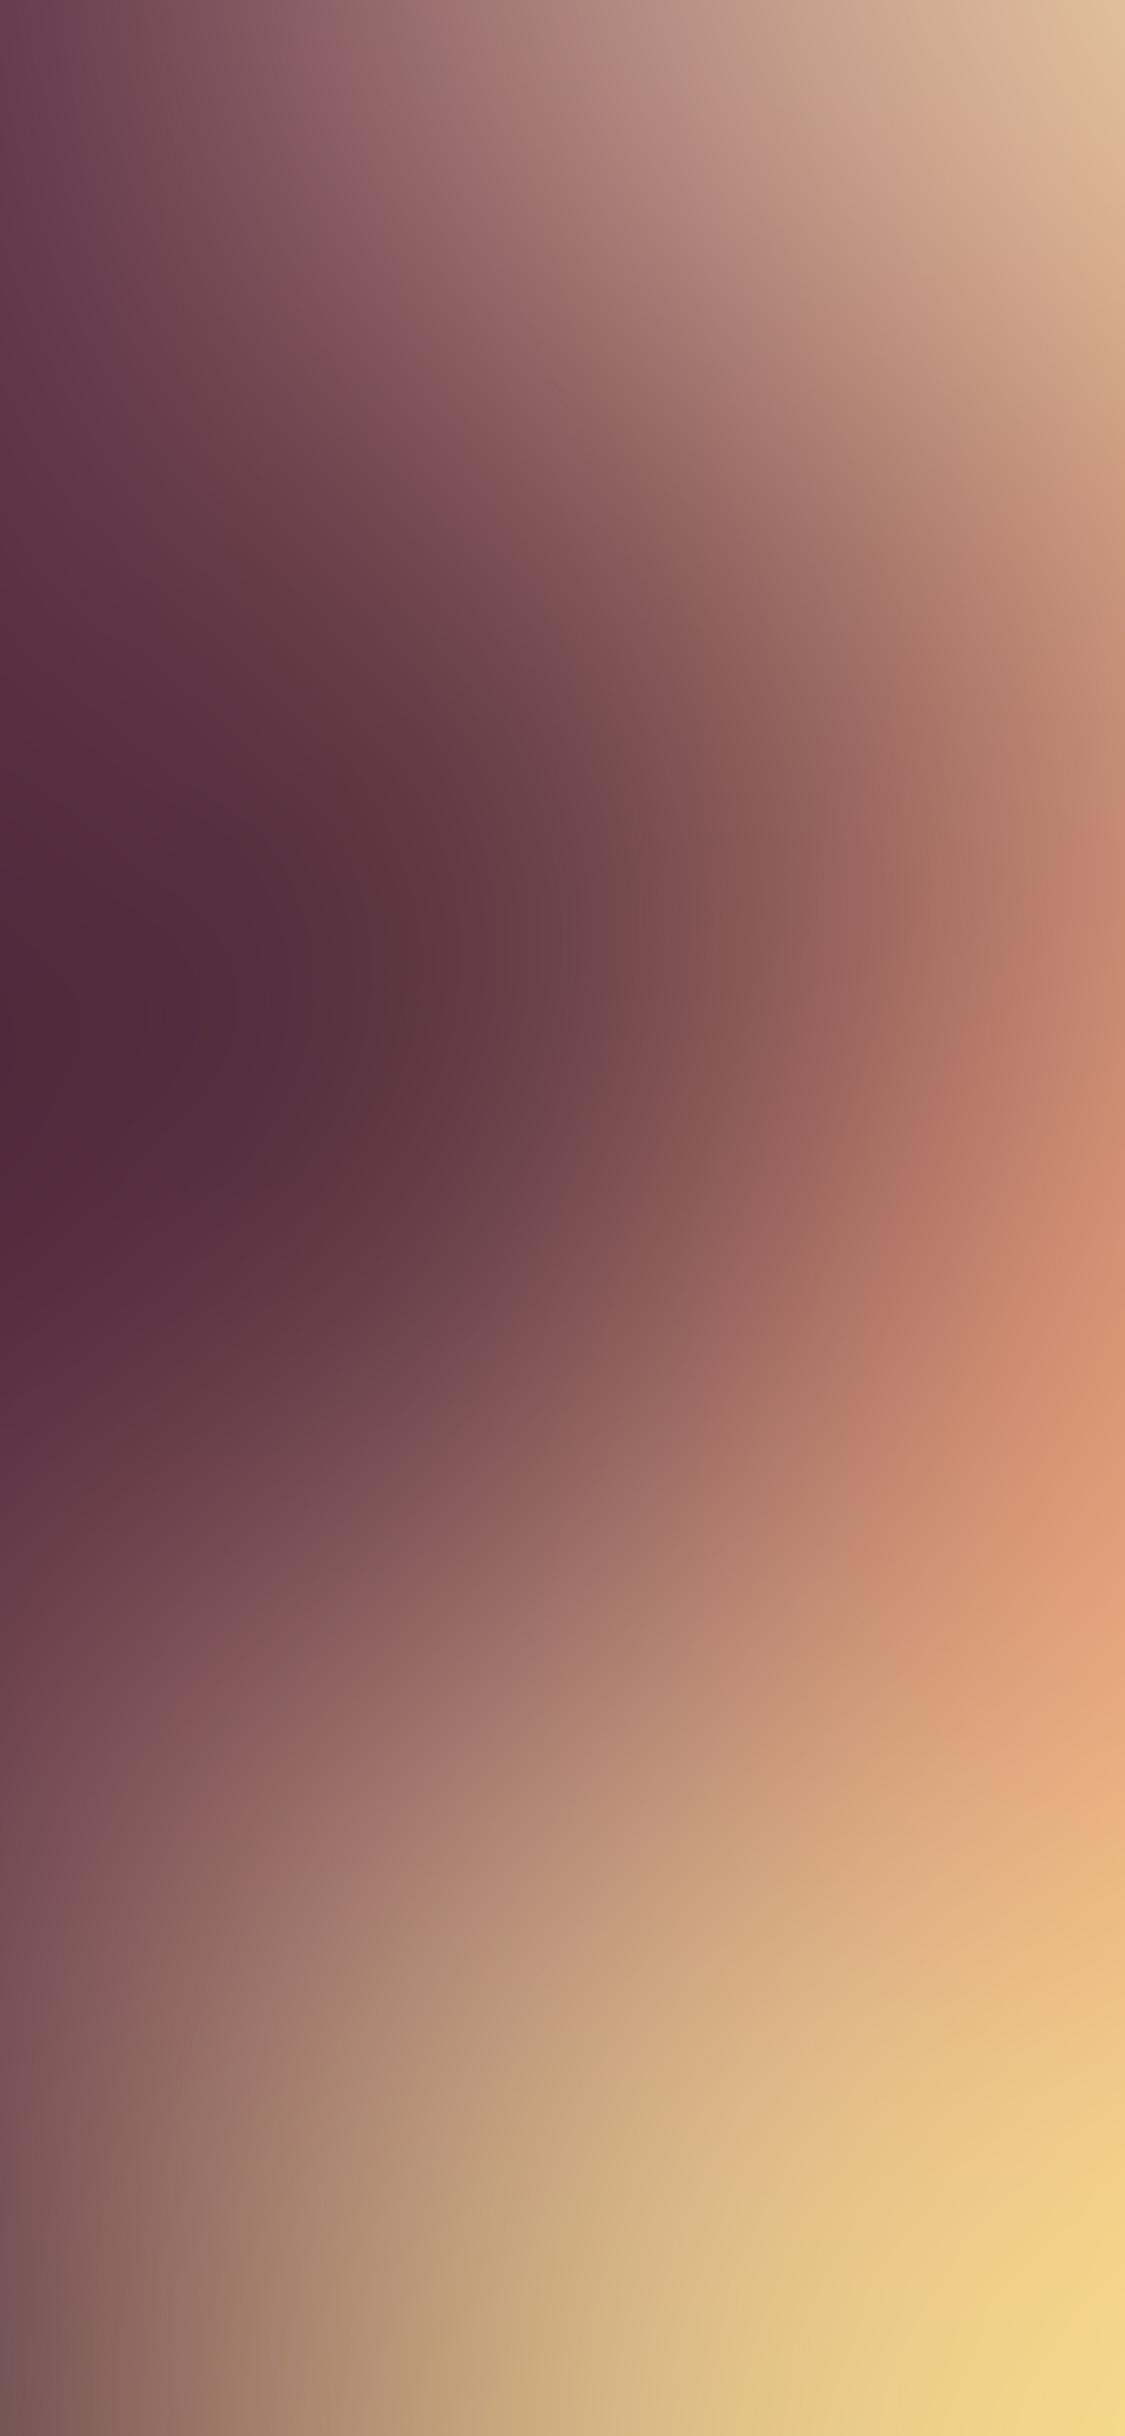 iPhoneXpapers.com-Apple-iPhone-wallpaper-sg75-mom-is-here-purple-gradation-blur